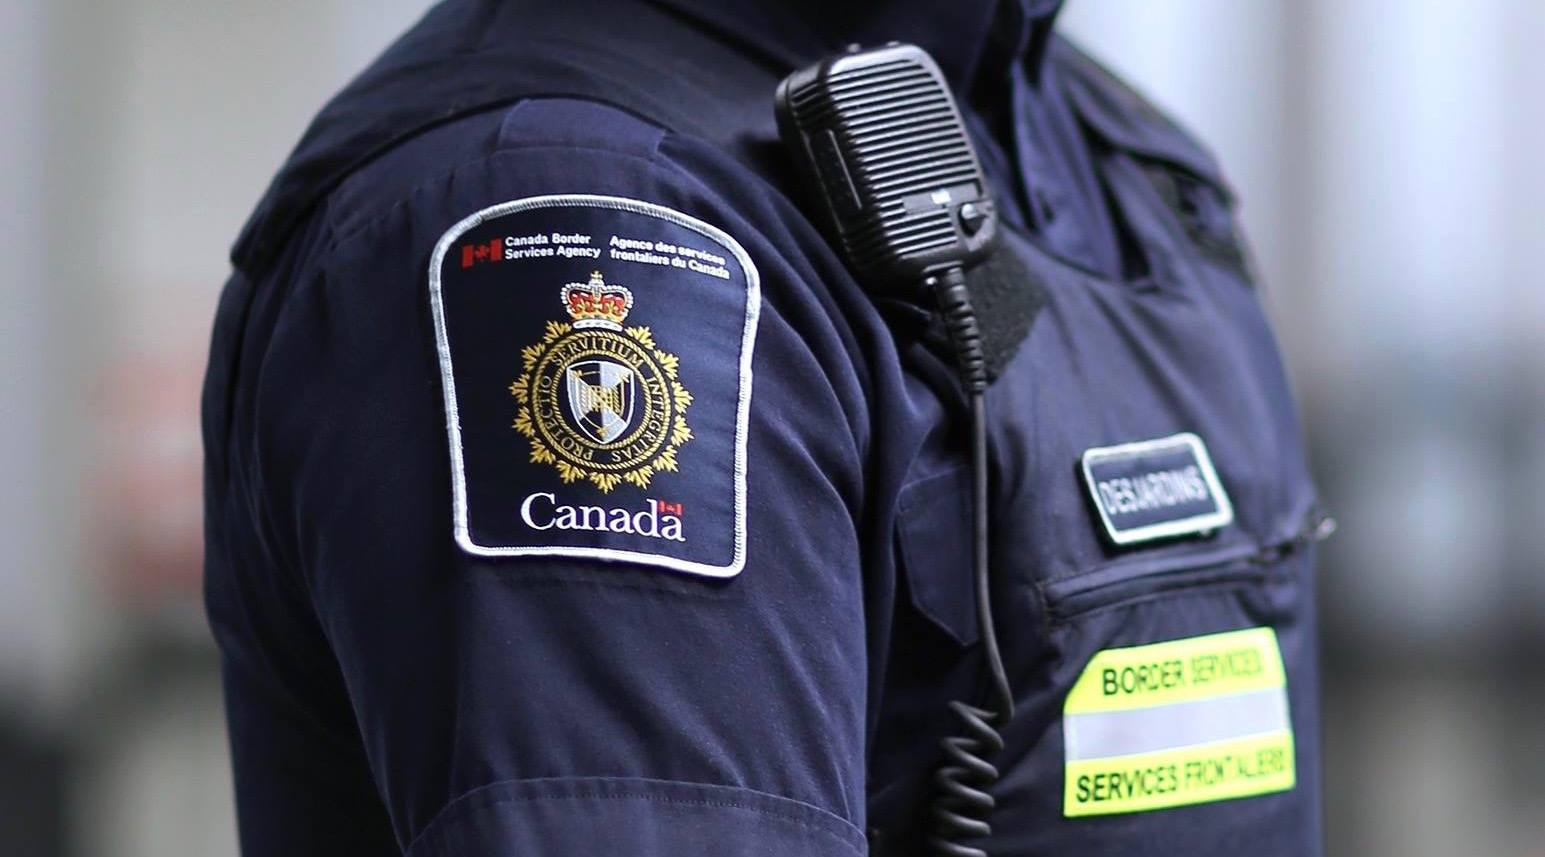 Canada border services